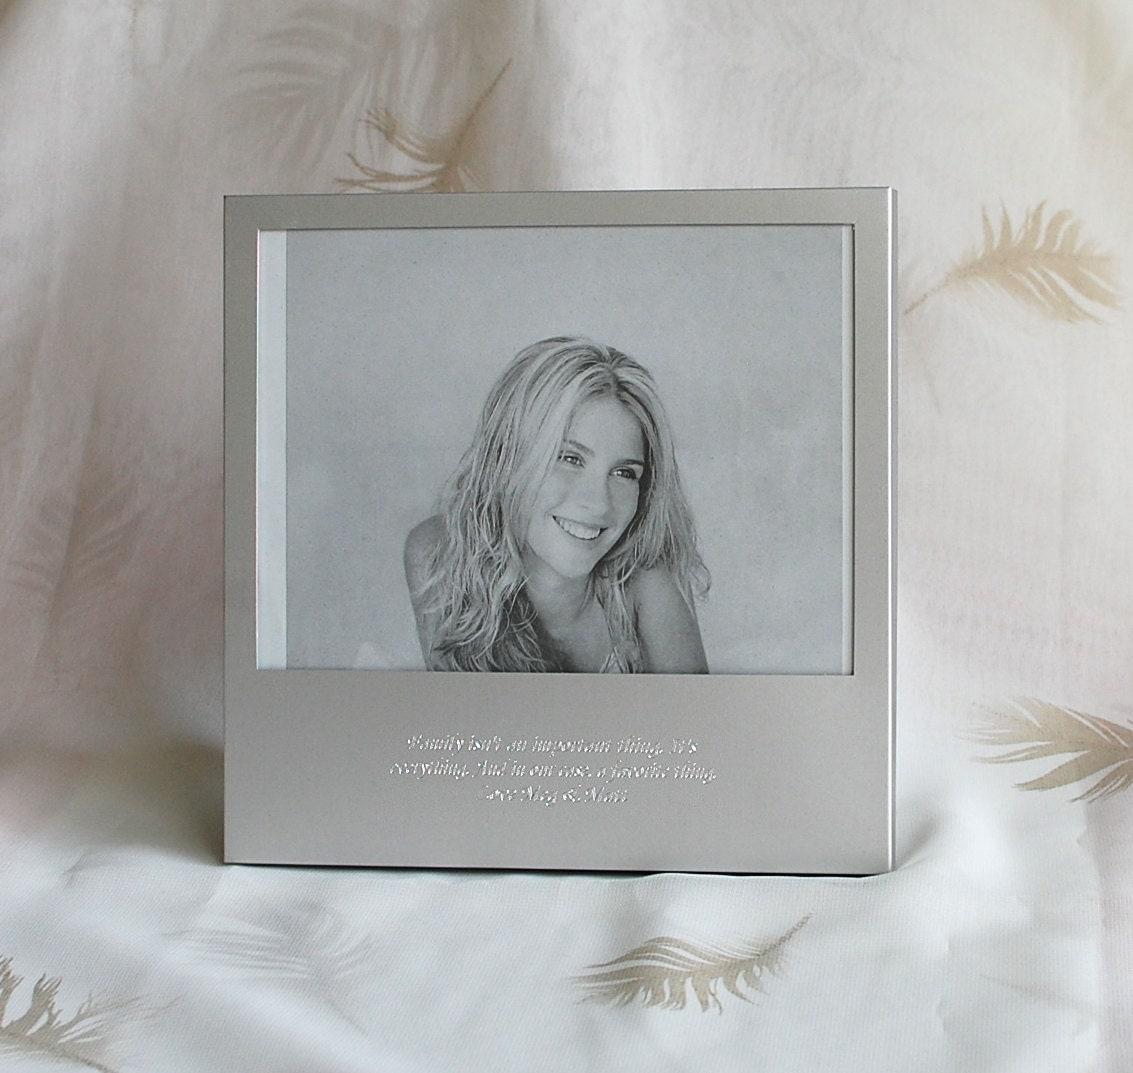 cadre photo 5 x 7 personnalis avec citation cadre photo. Black Bedroom Furniture Sets. Home Design Ideas